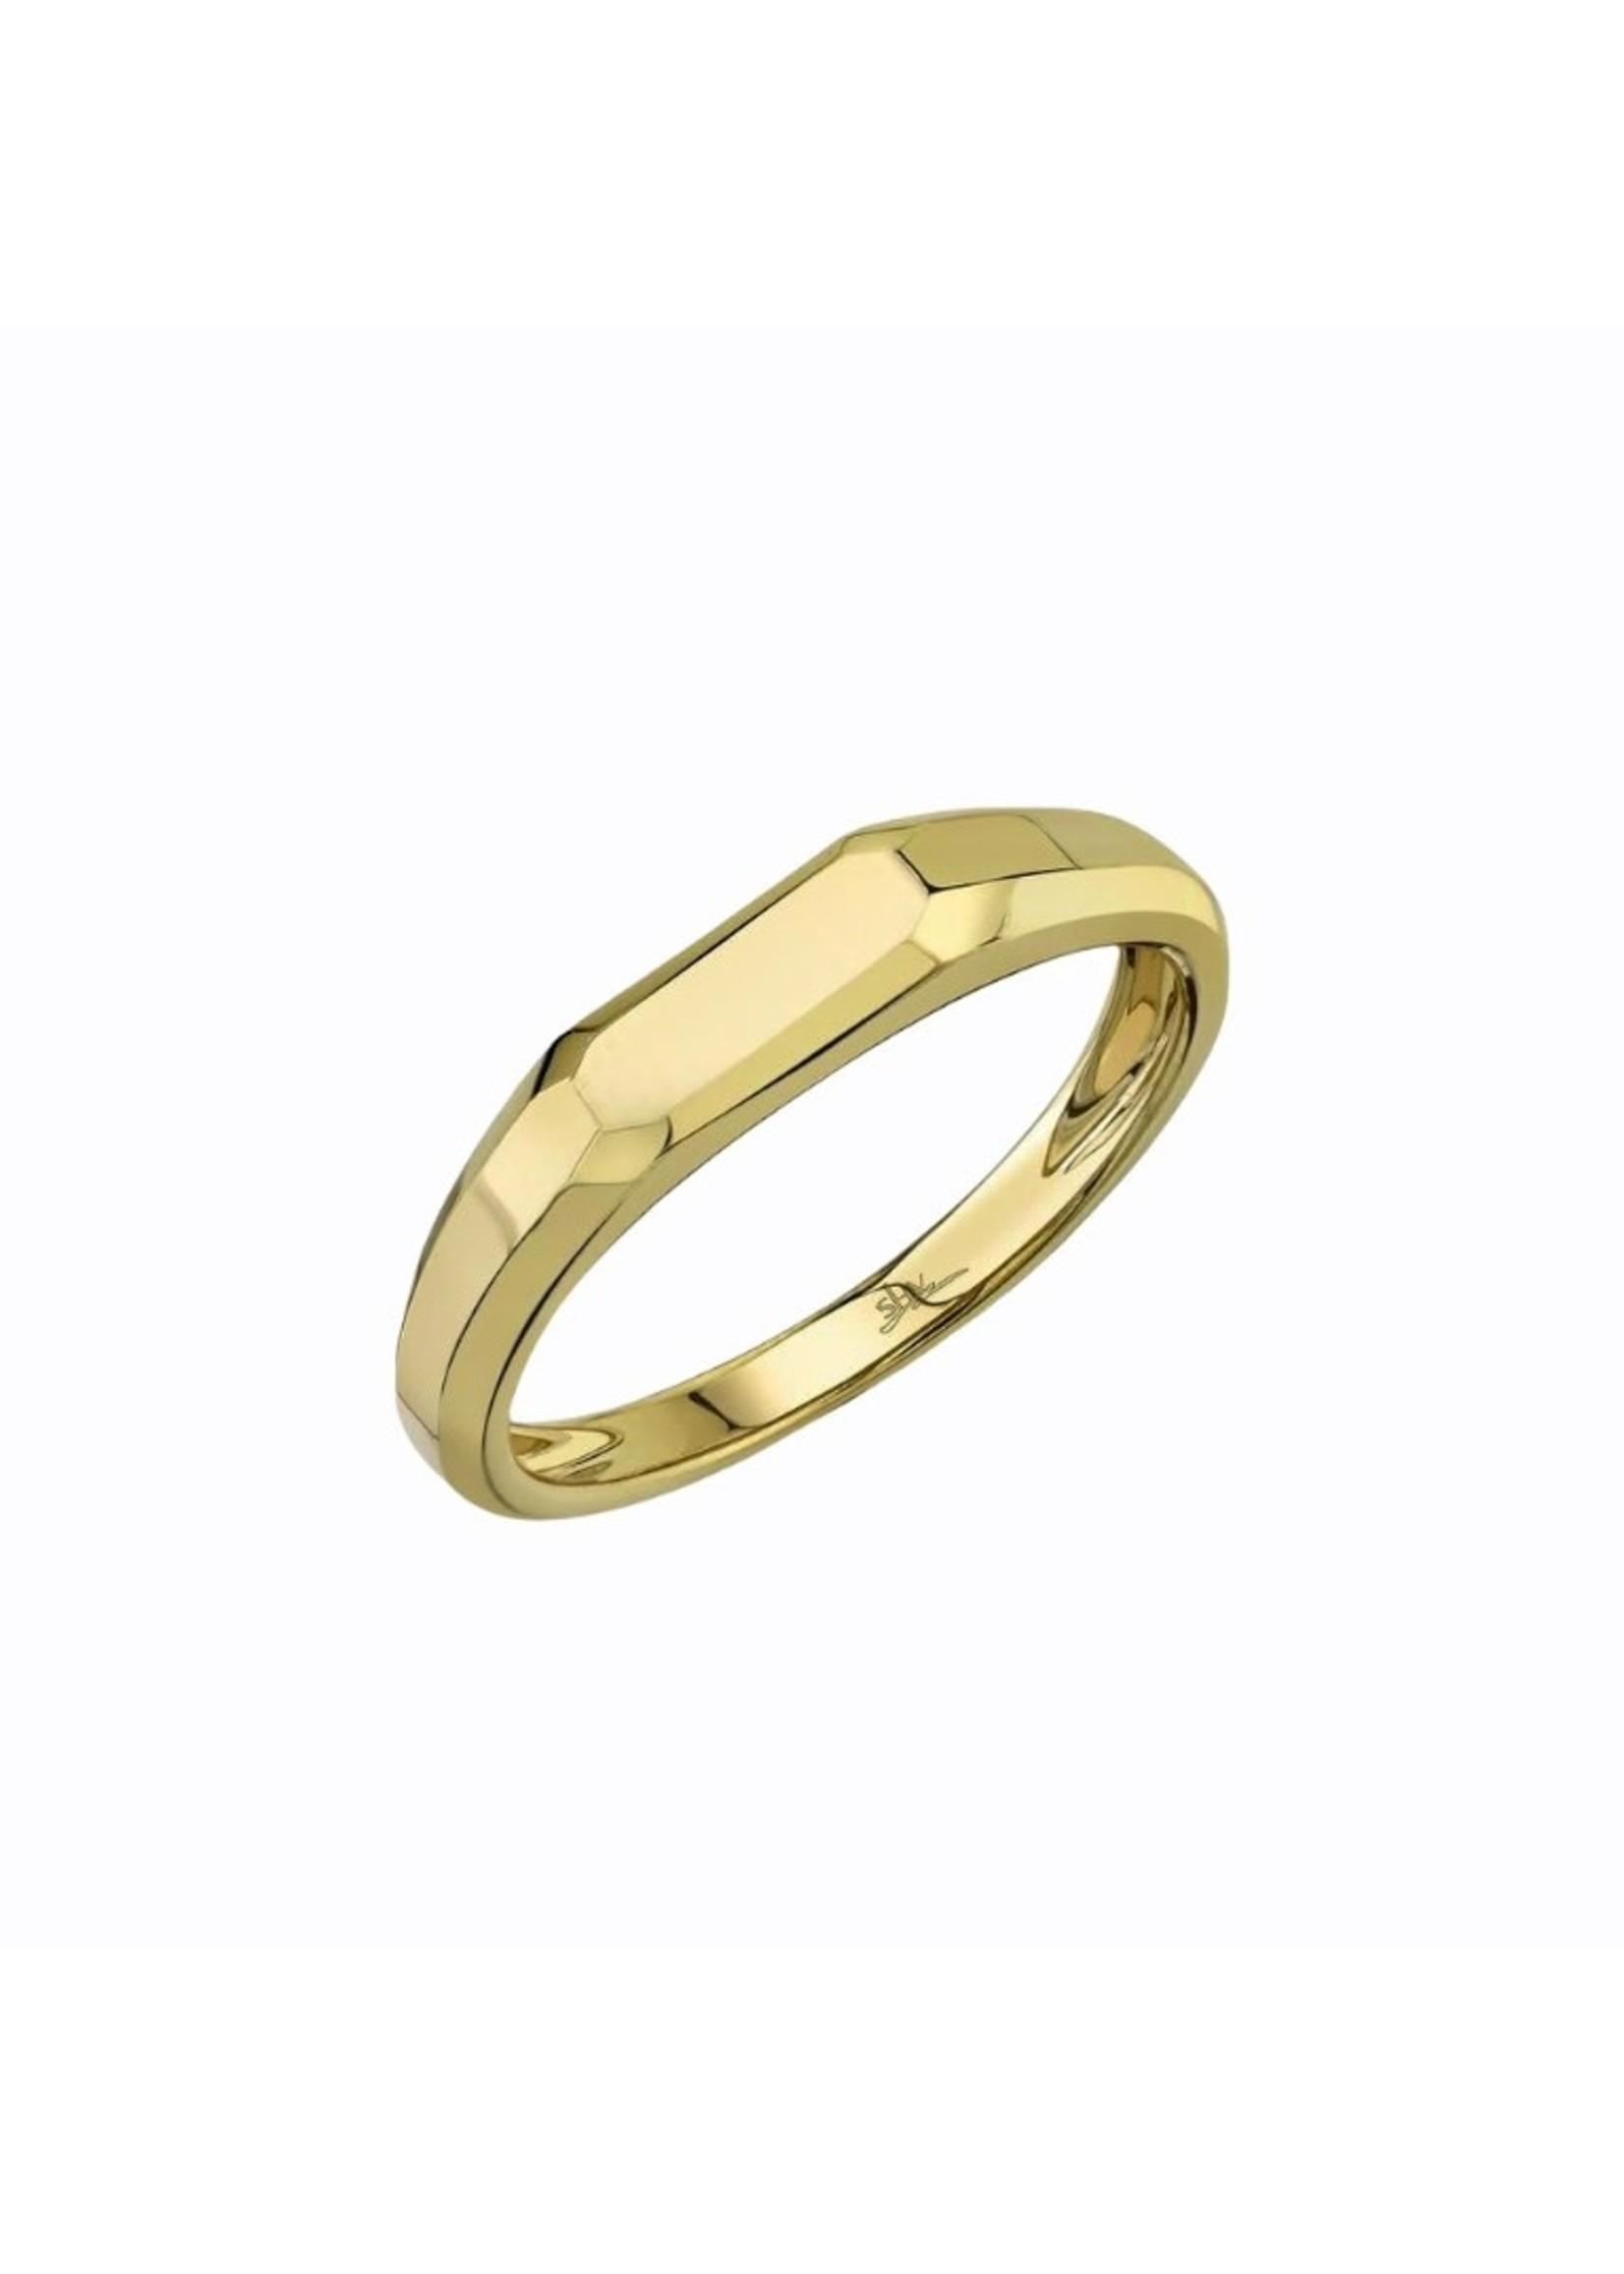 Jill Alberts Yellow Gold Band